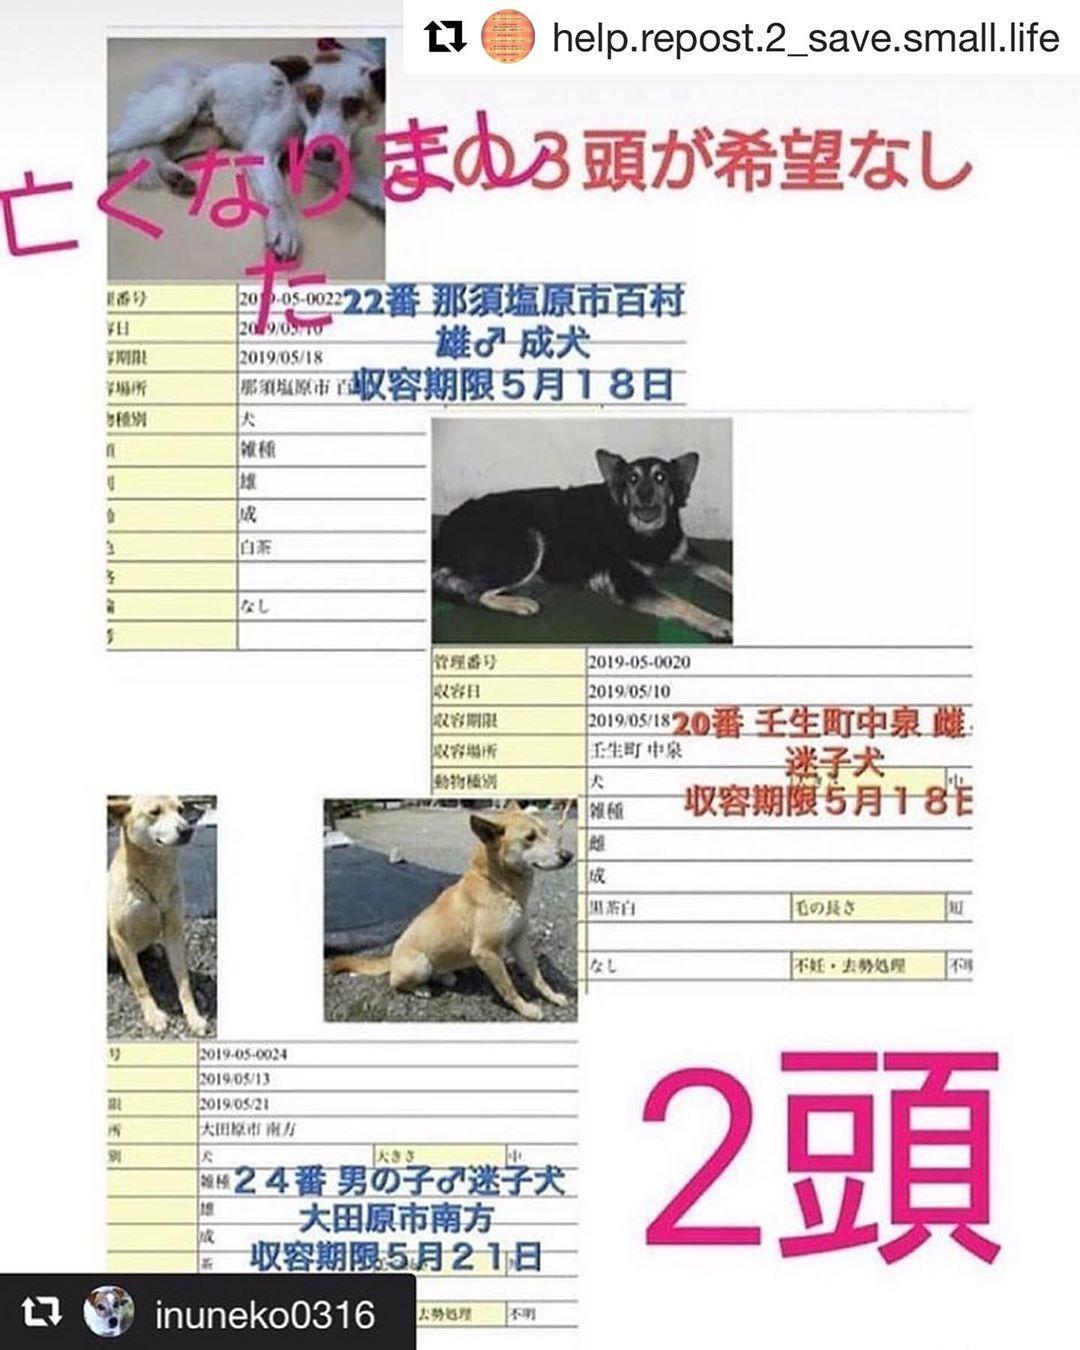 Repost Help Repost 2 Save Small Life With Get Repost Repost Save Dogs Cats Japan Repost Inuneko0316 Repost Savewannyan 拡散希望お願いします 上の子は亡くなって